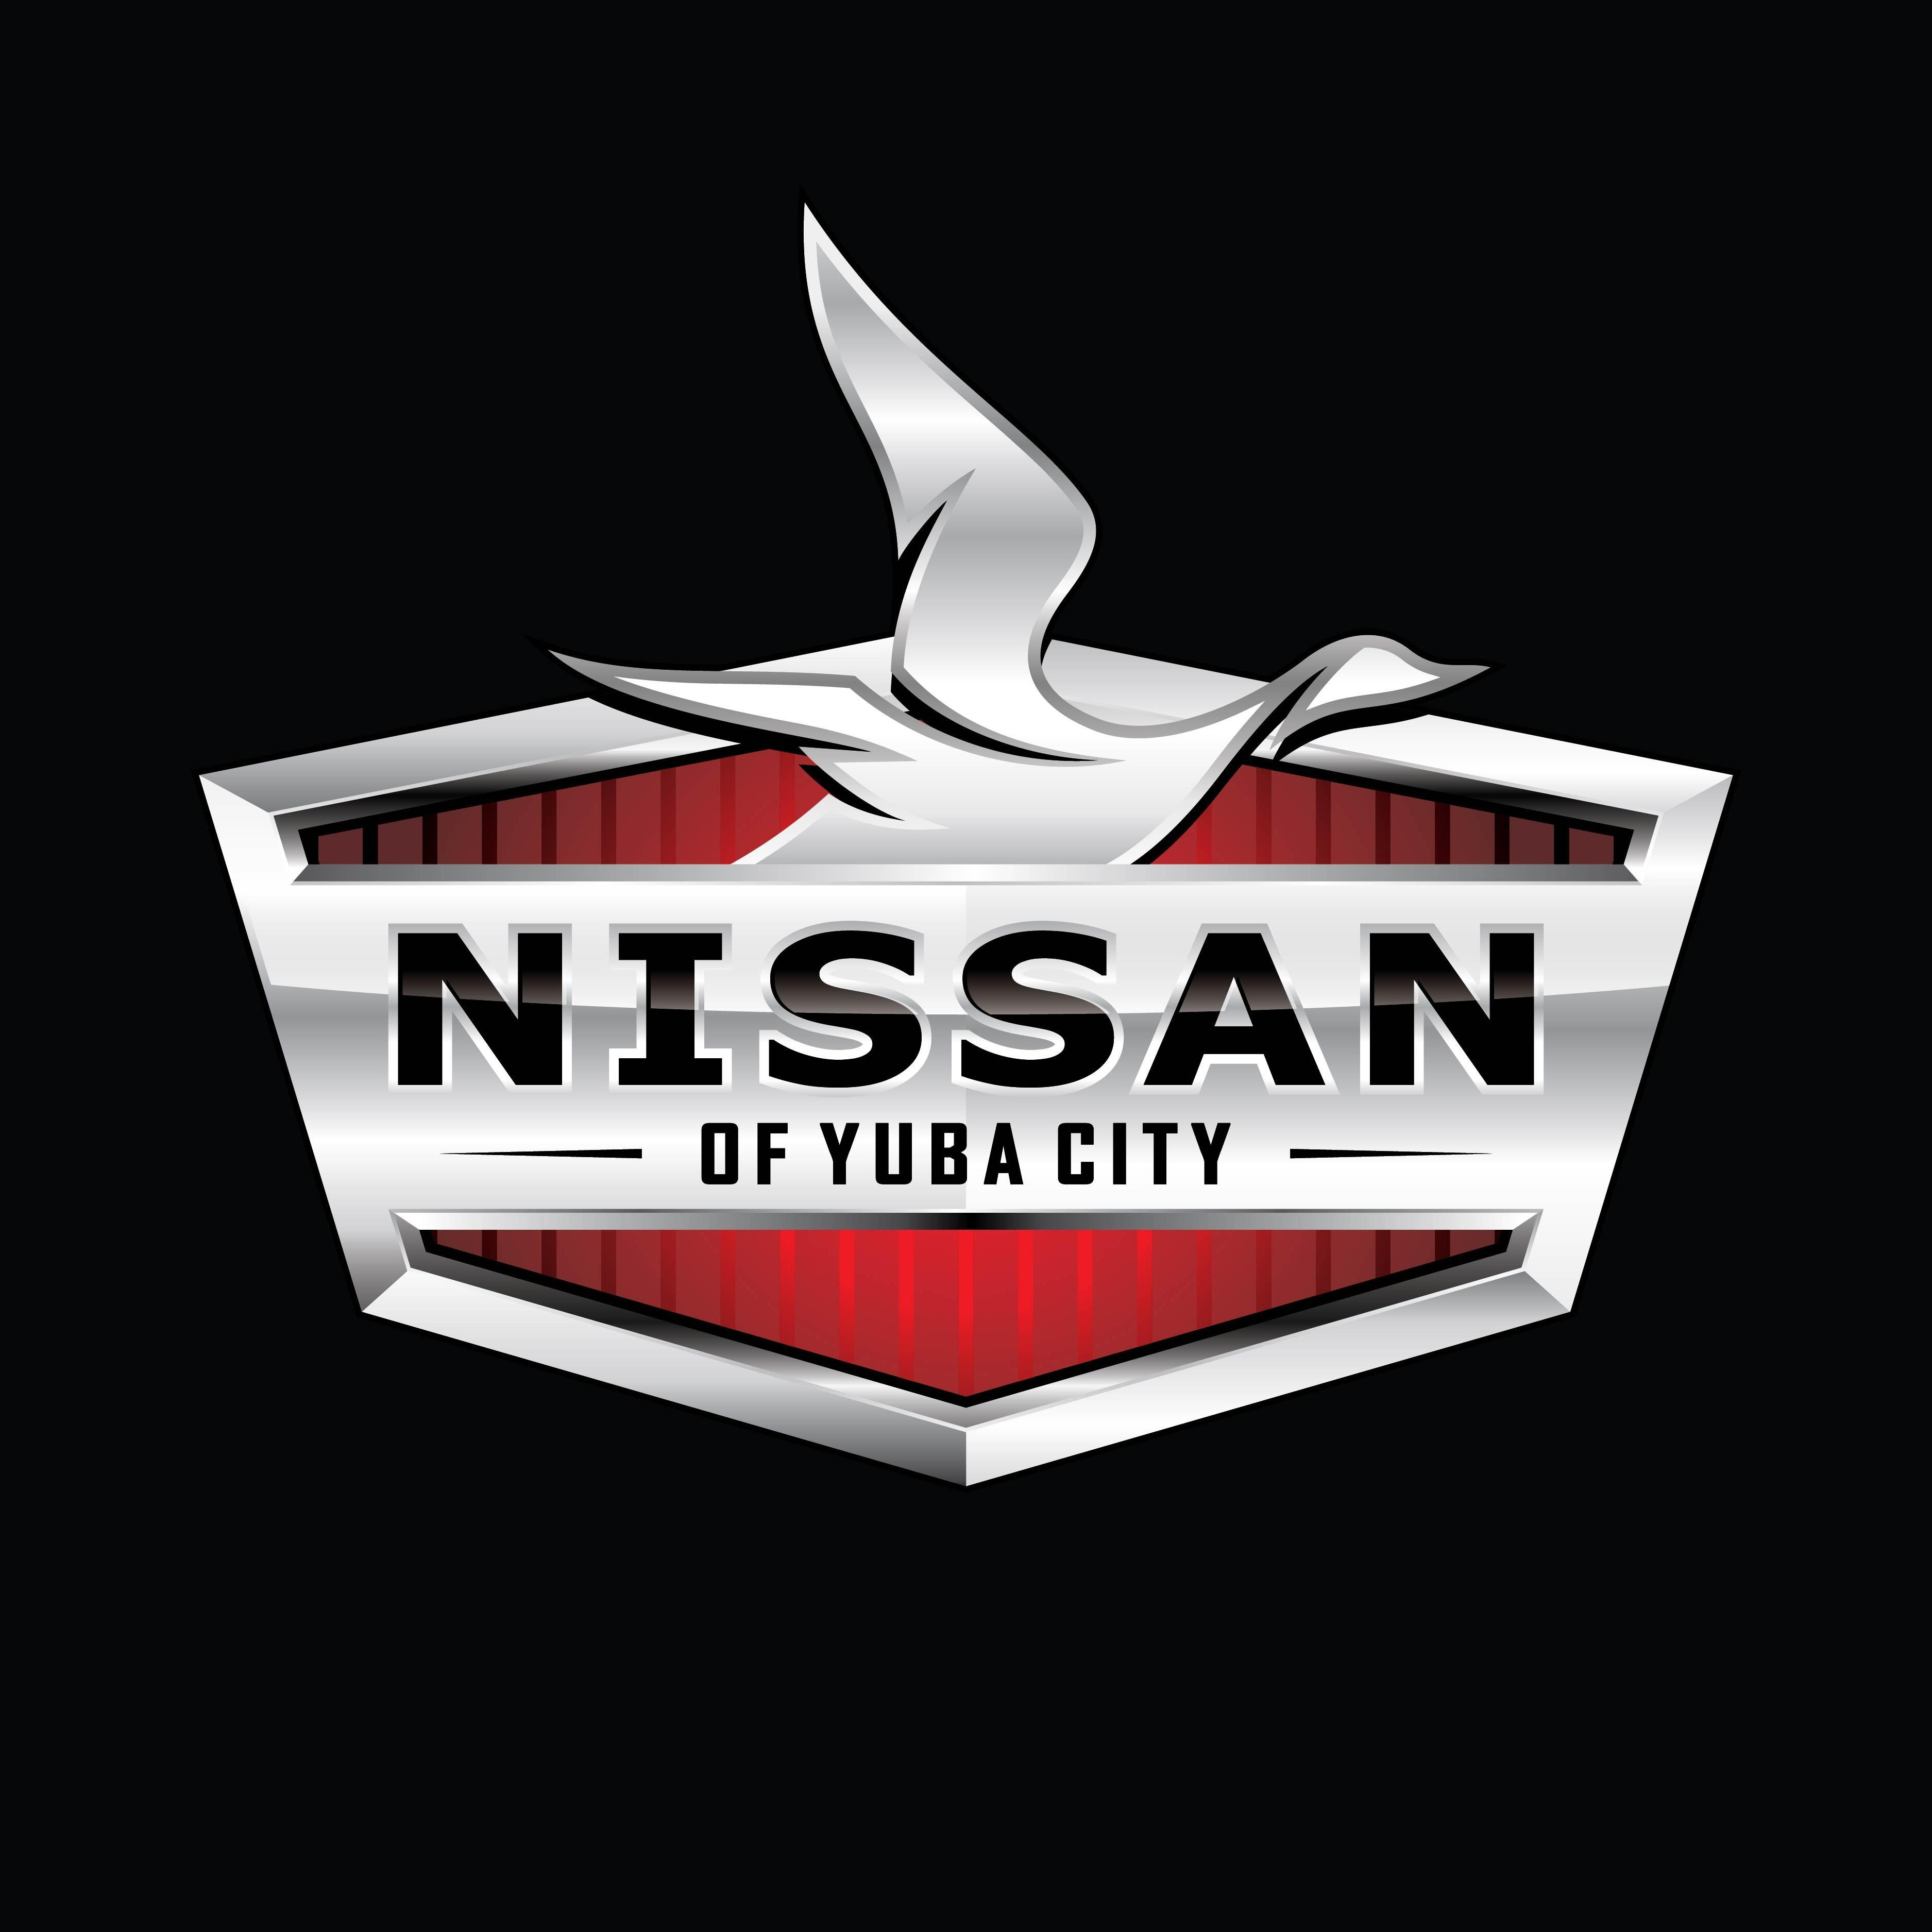 Yuba City Nissan >> Nissan of Yuba City (@YubaCityNissan) | Twitter